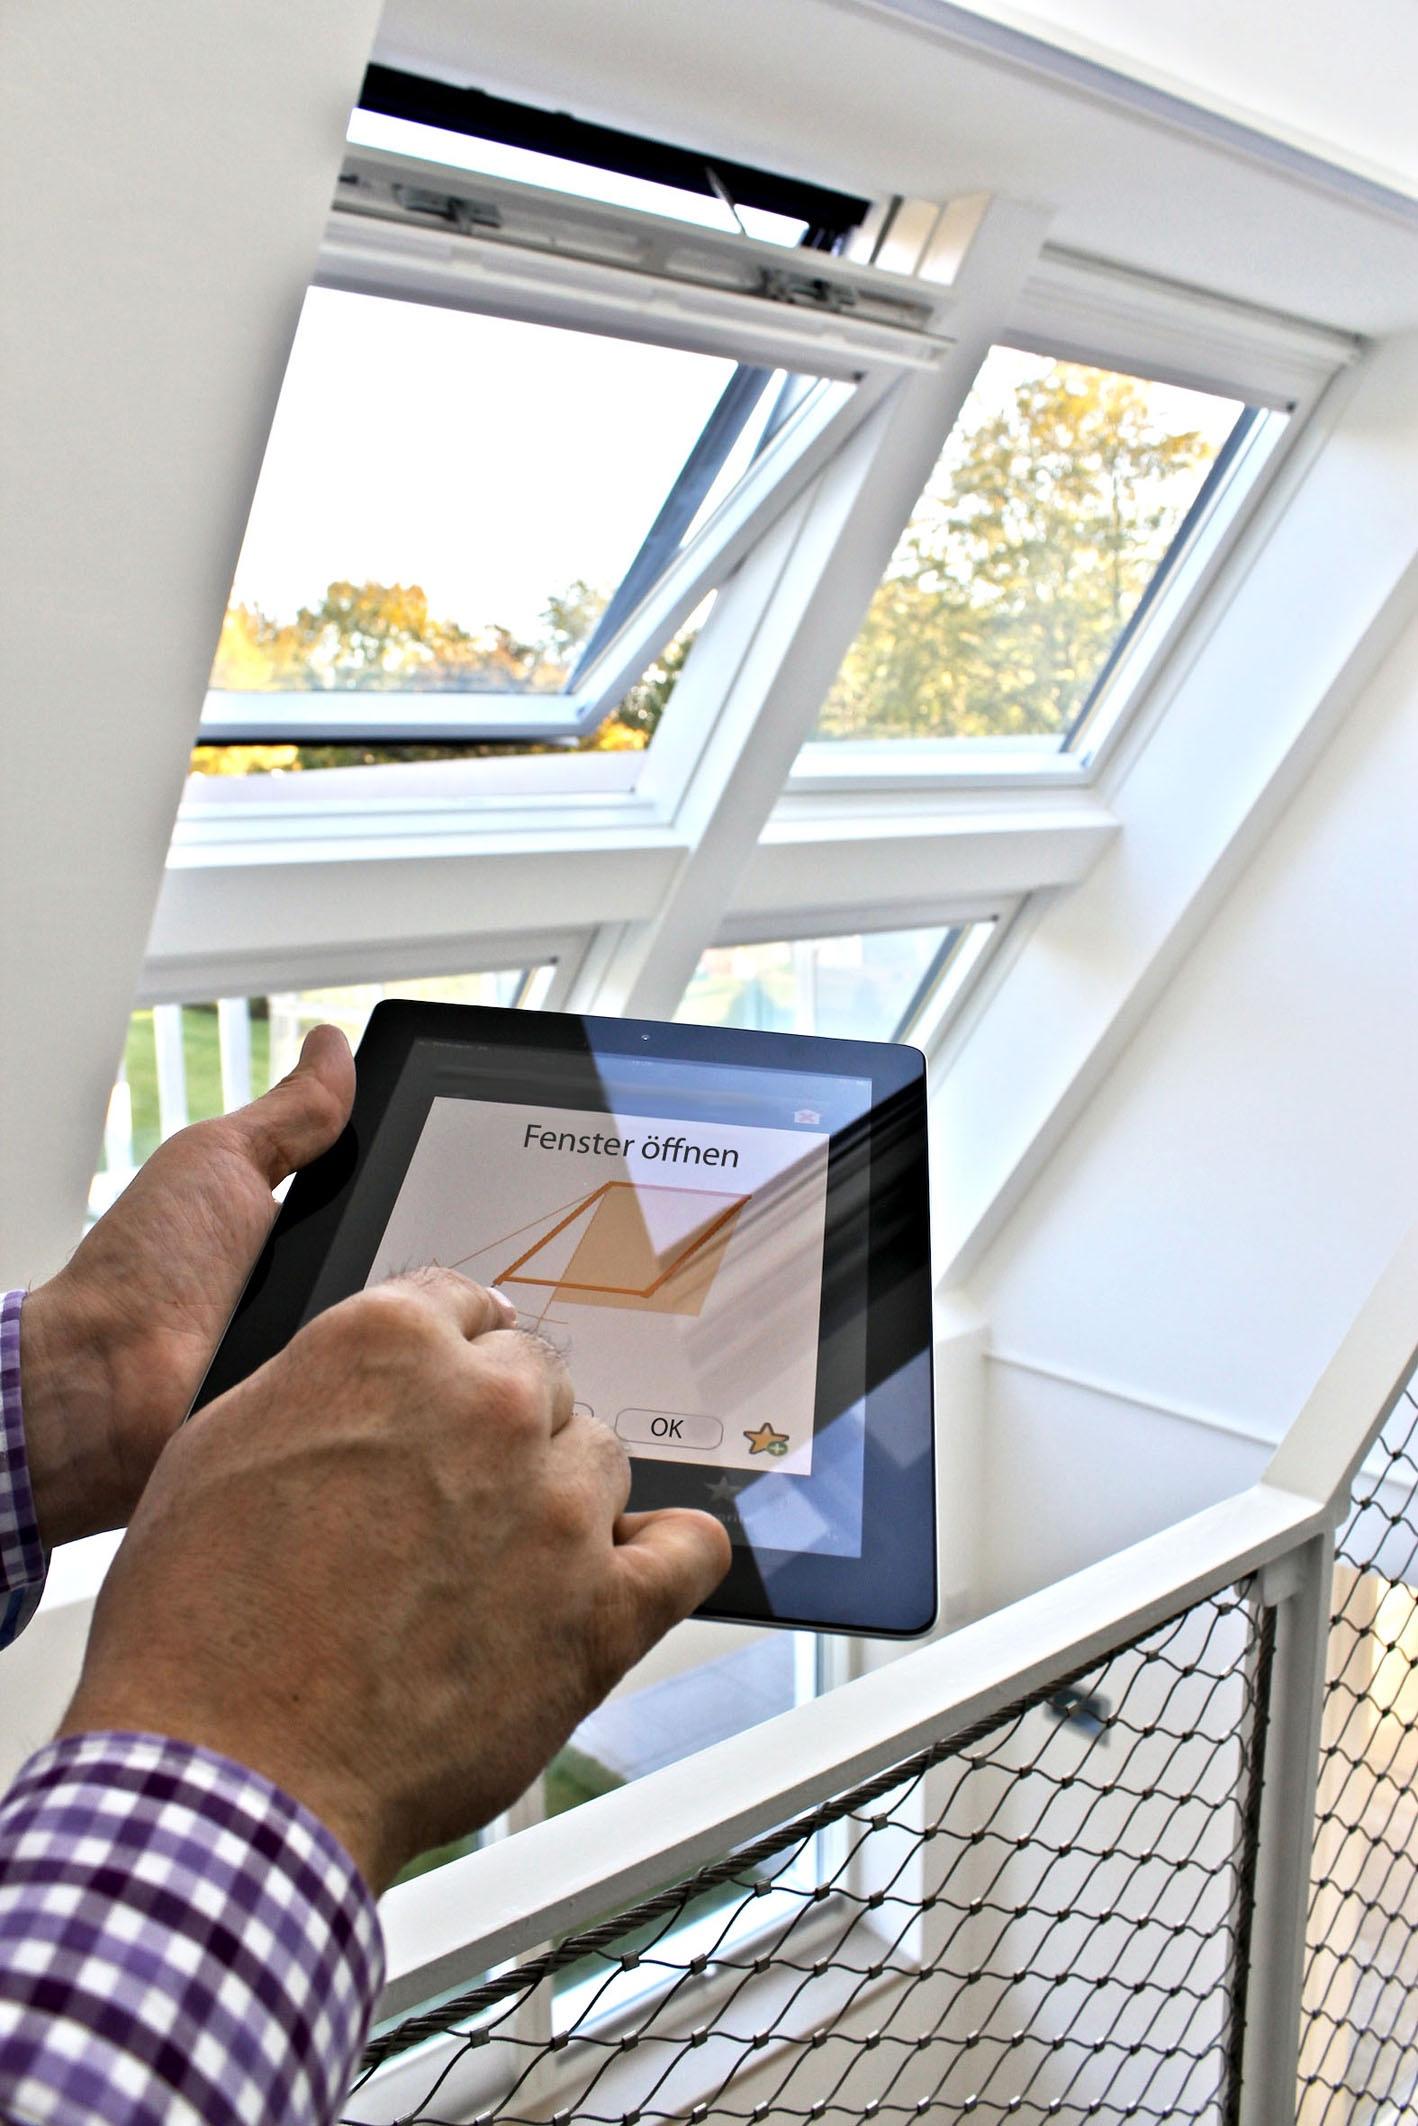 marktanalyse zukunftsmarkt smart home fenster baustoffwissen. Black Bedroom Furniture Sets. Home Design Ideas